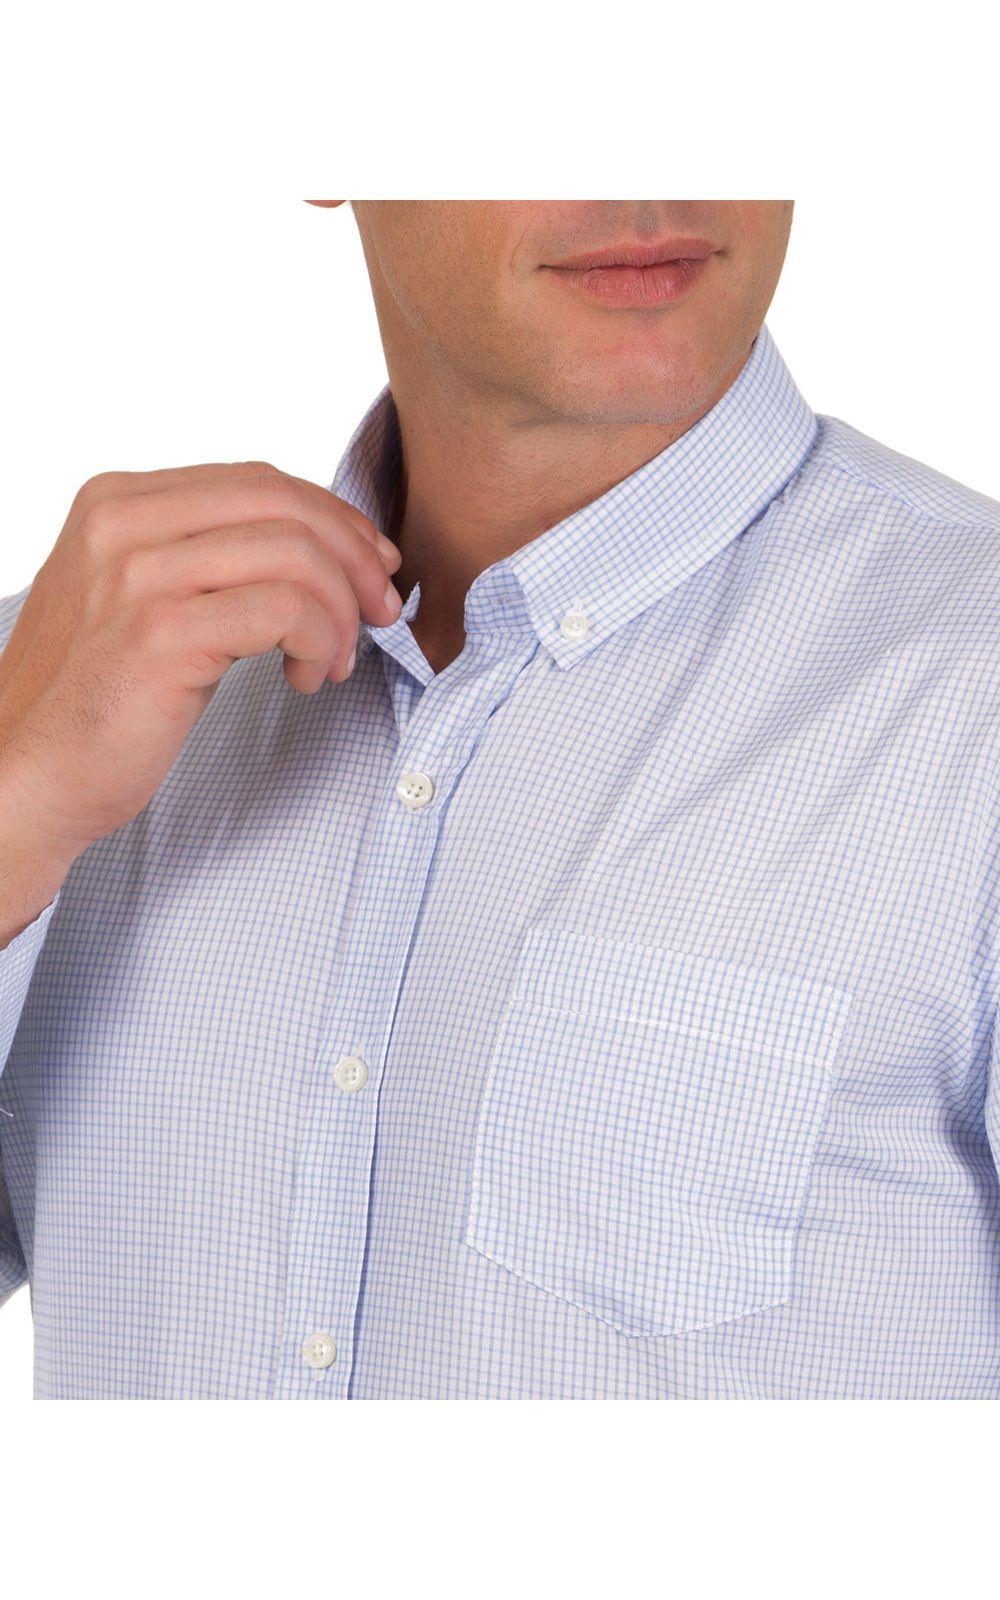 Foto 3 - Camisa Social Masculina Azul Claro Xadrez